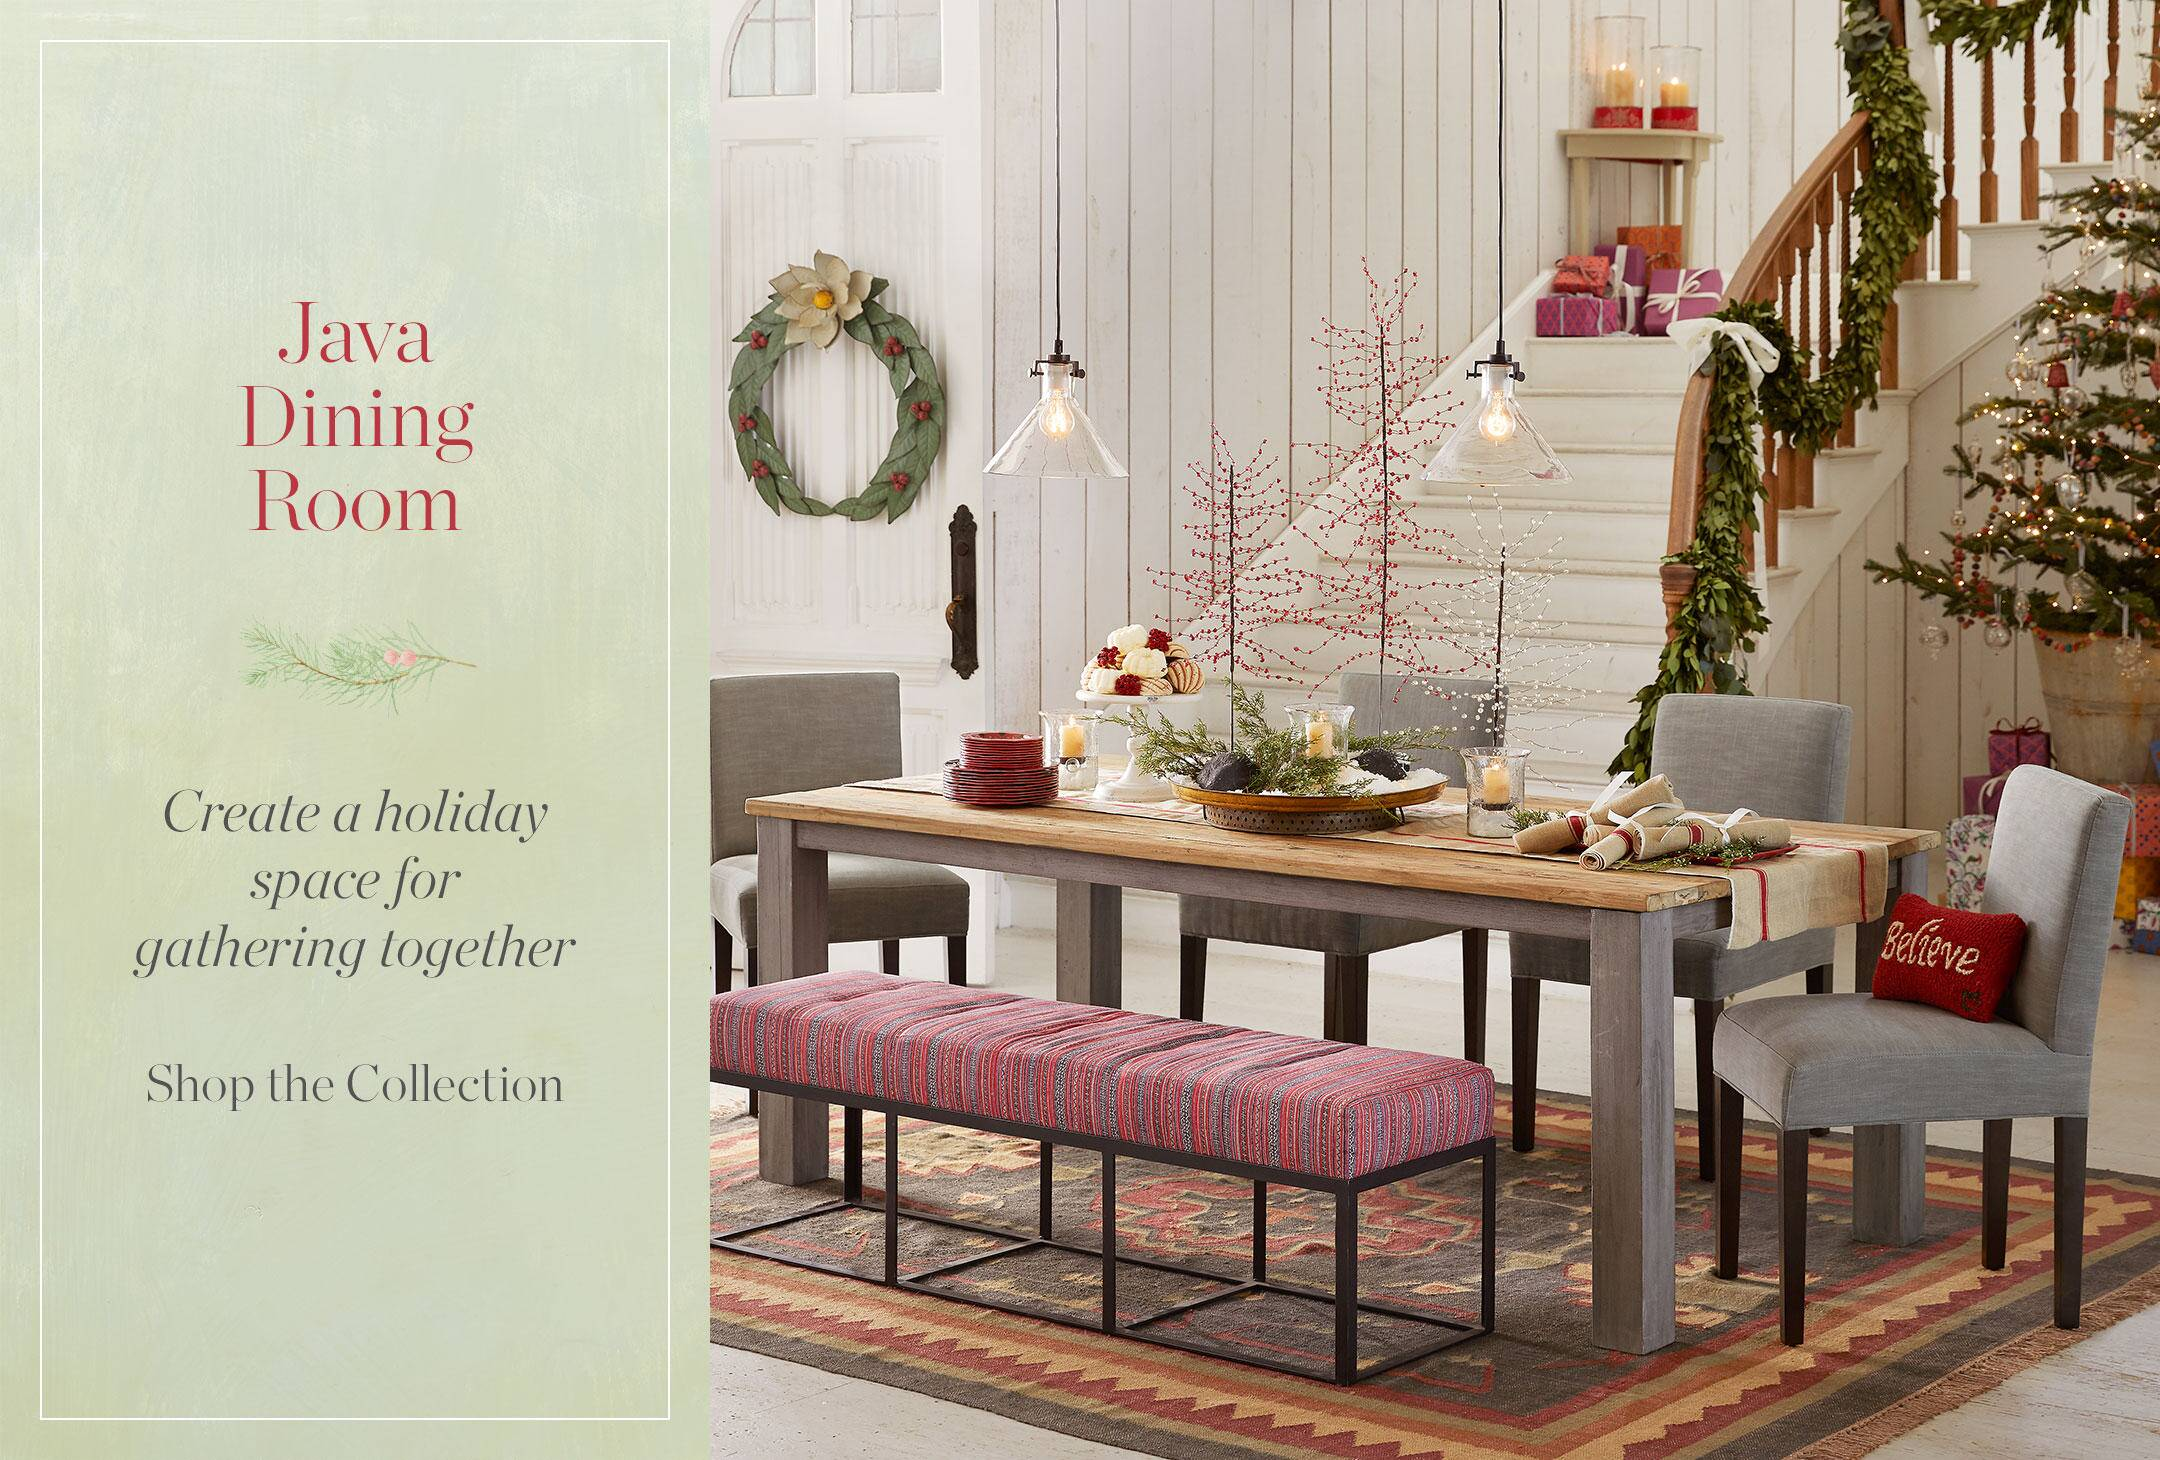 Java Dining Room